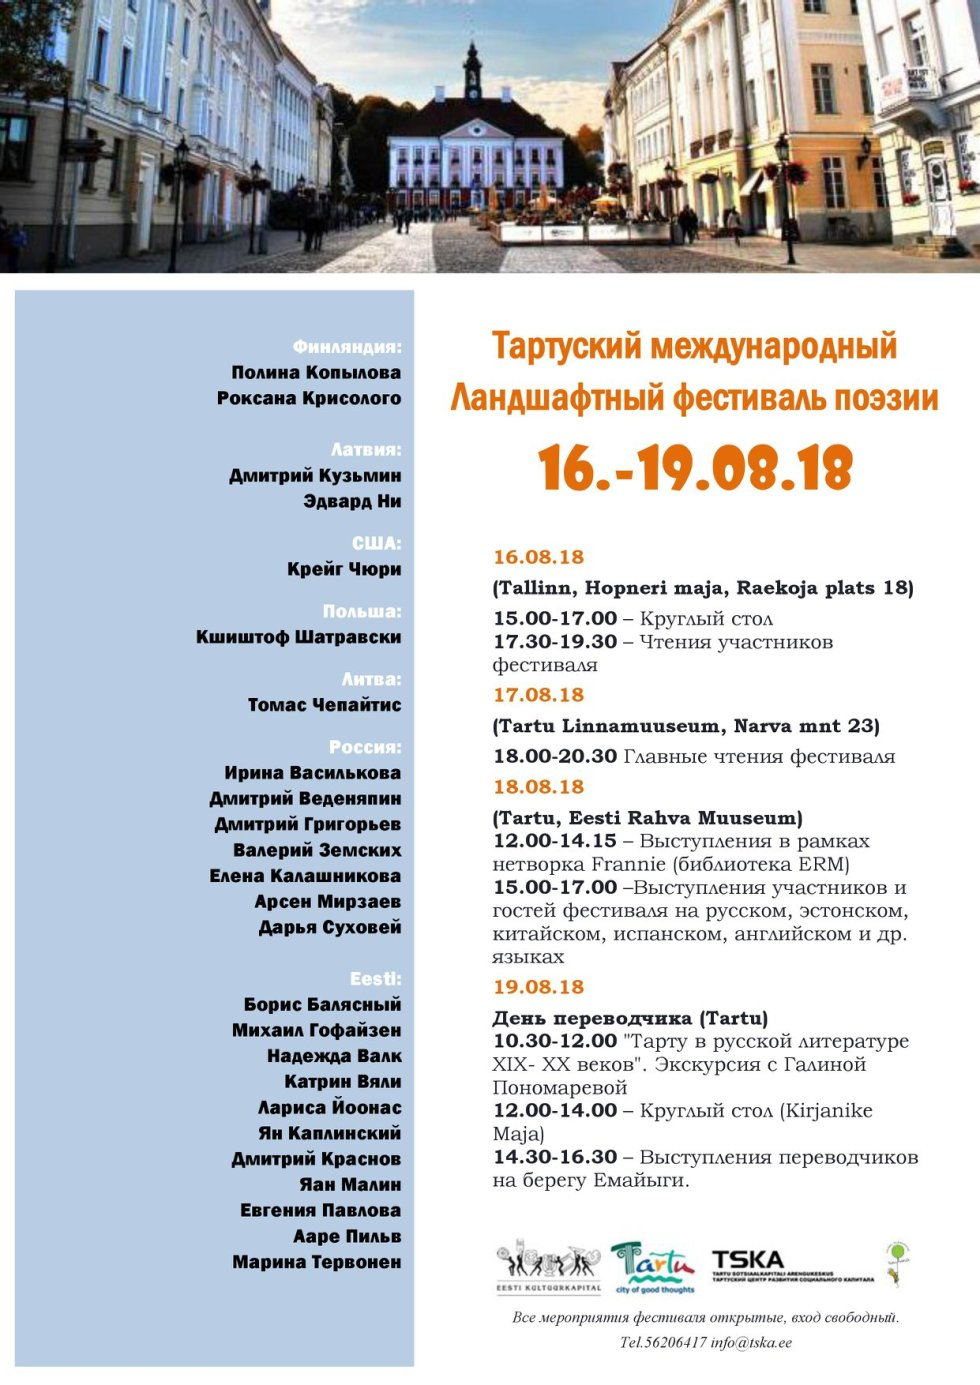 Festival TartuEstonia